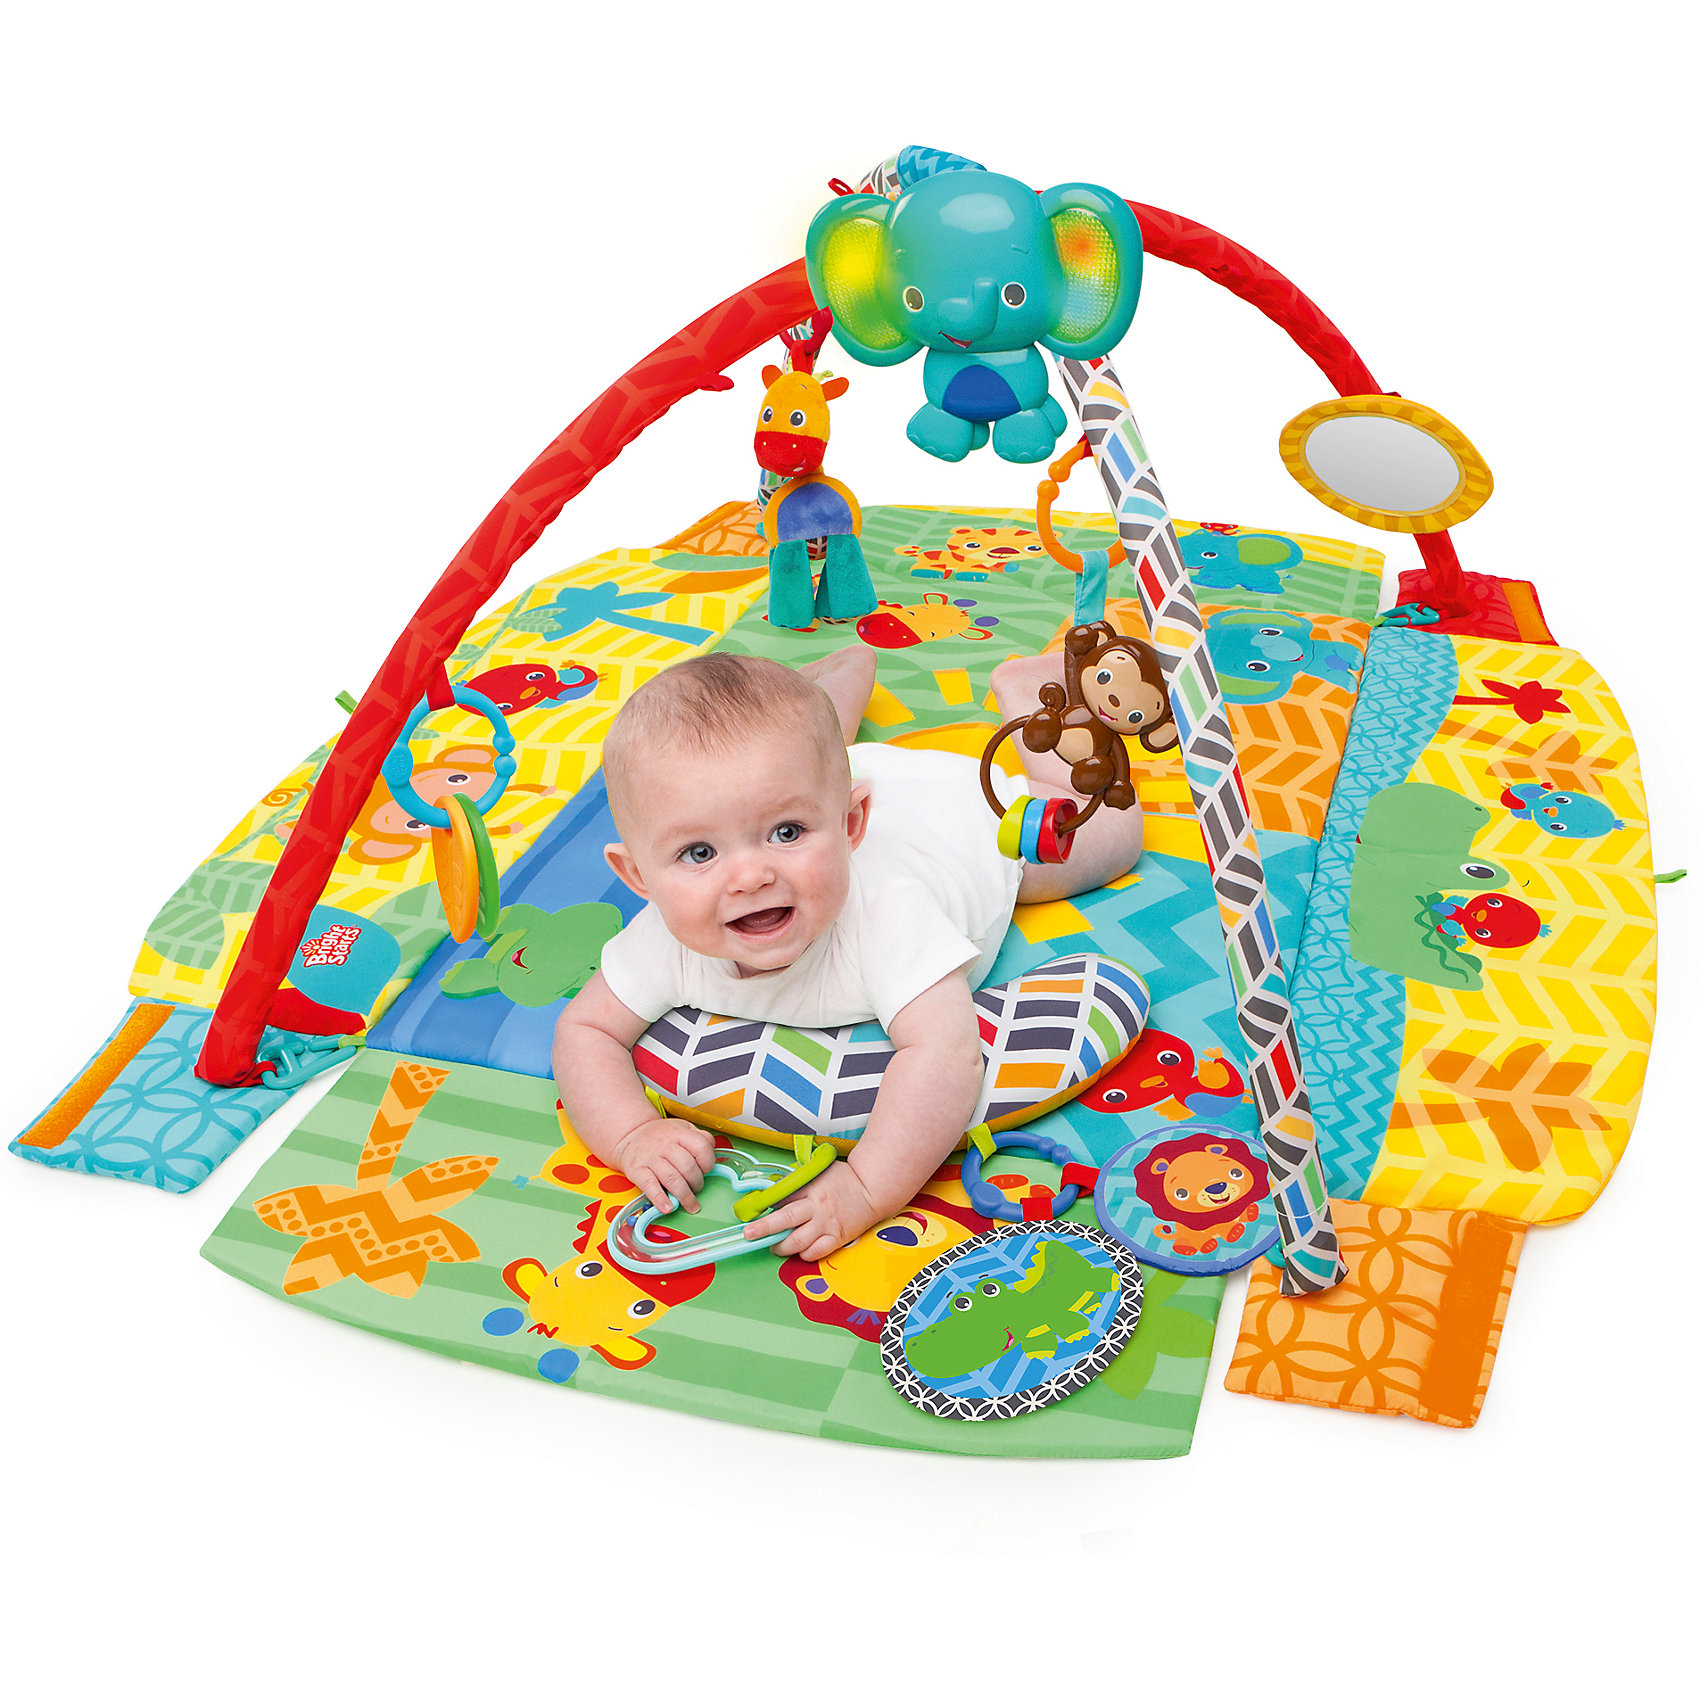 Kids II Развивающий коврик Солнечное сафари, Bright Starts roxy kids антискользящий коврик для ванны цвет желтый 34 см х 74 см